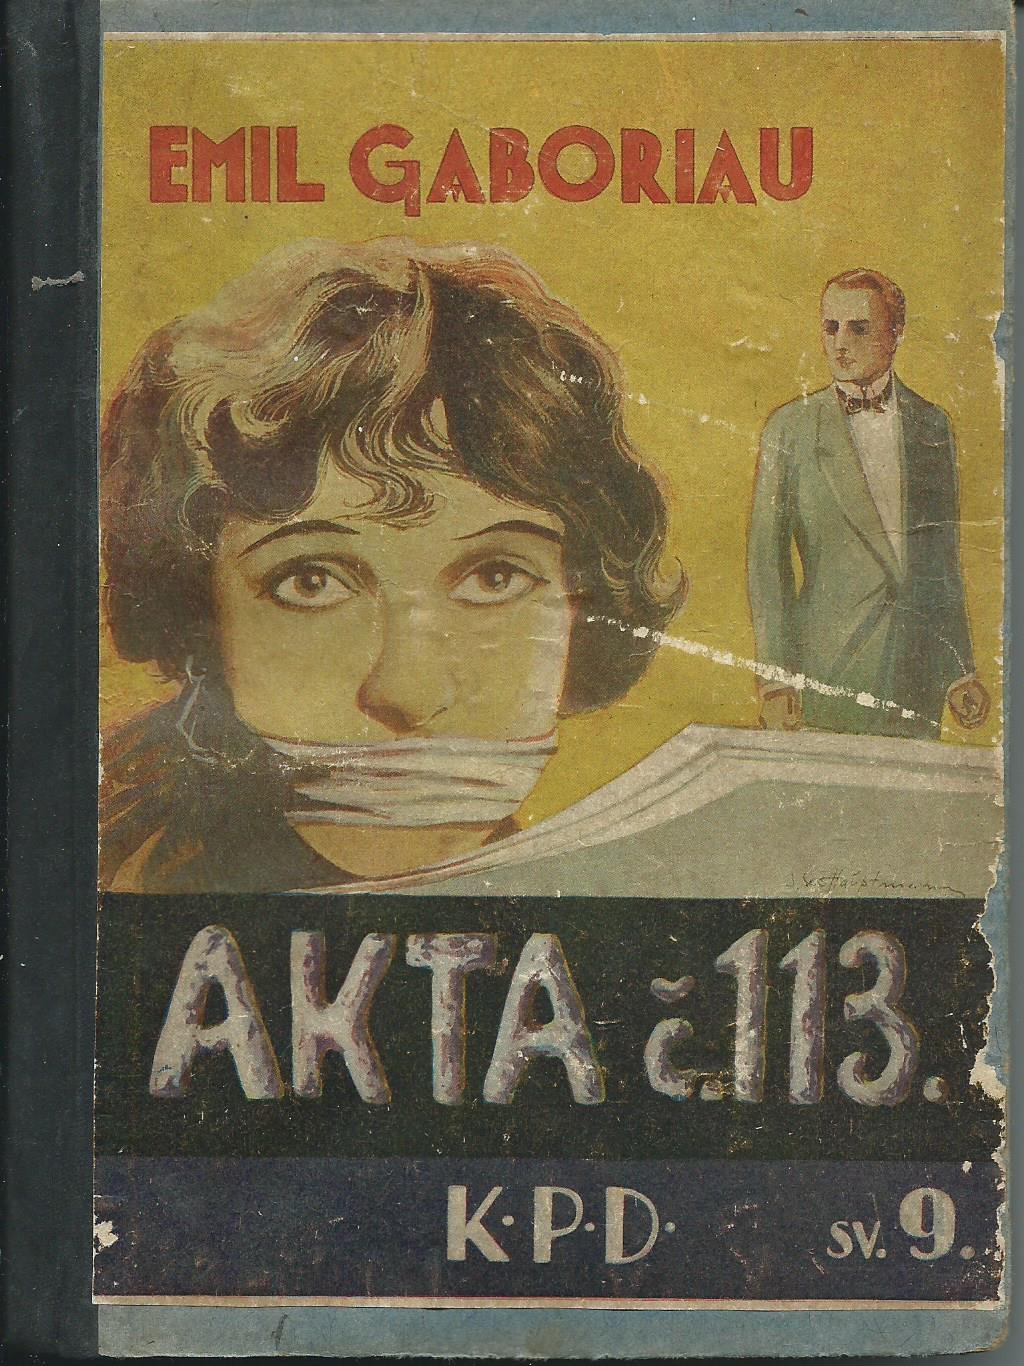 Akta č.113 - Emil Gaboriau